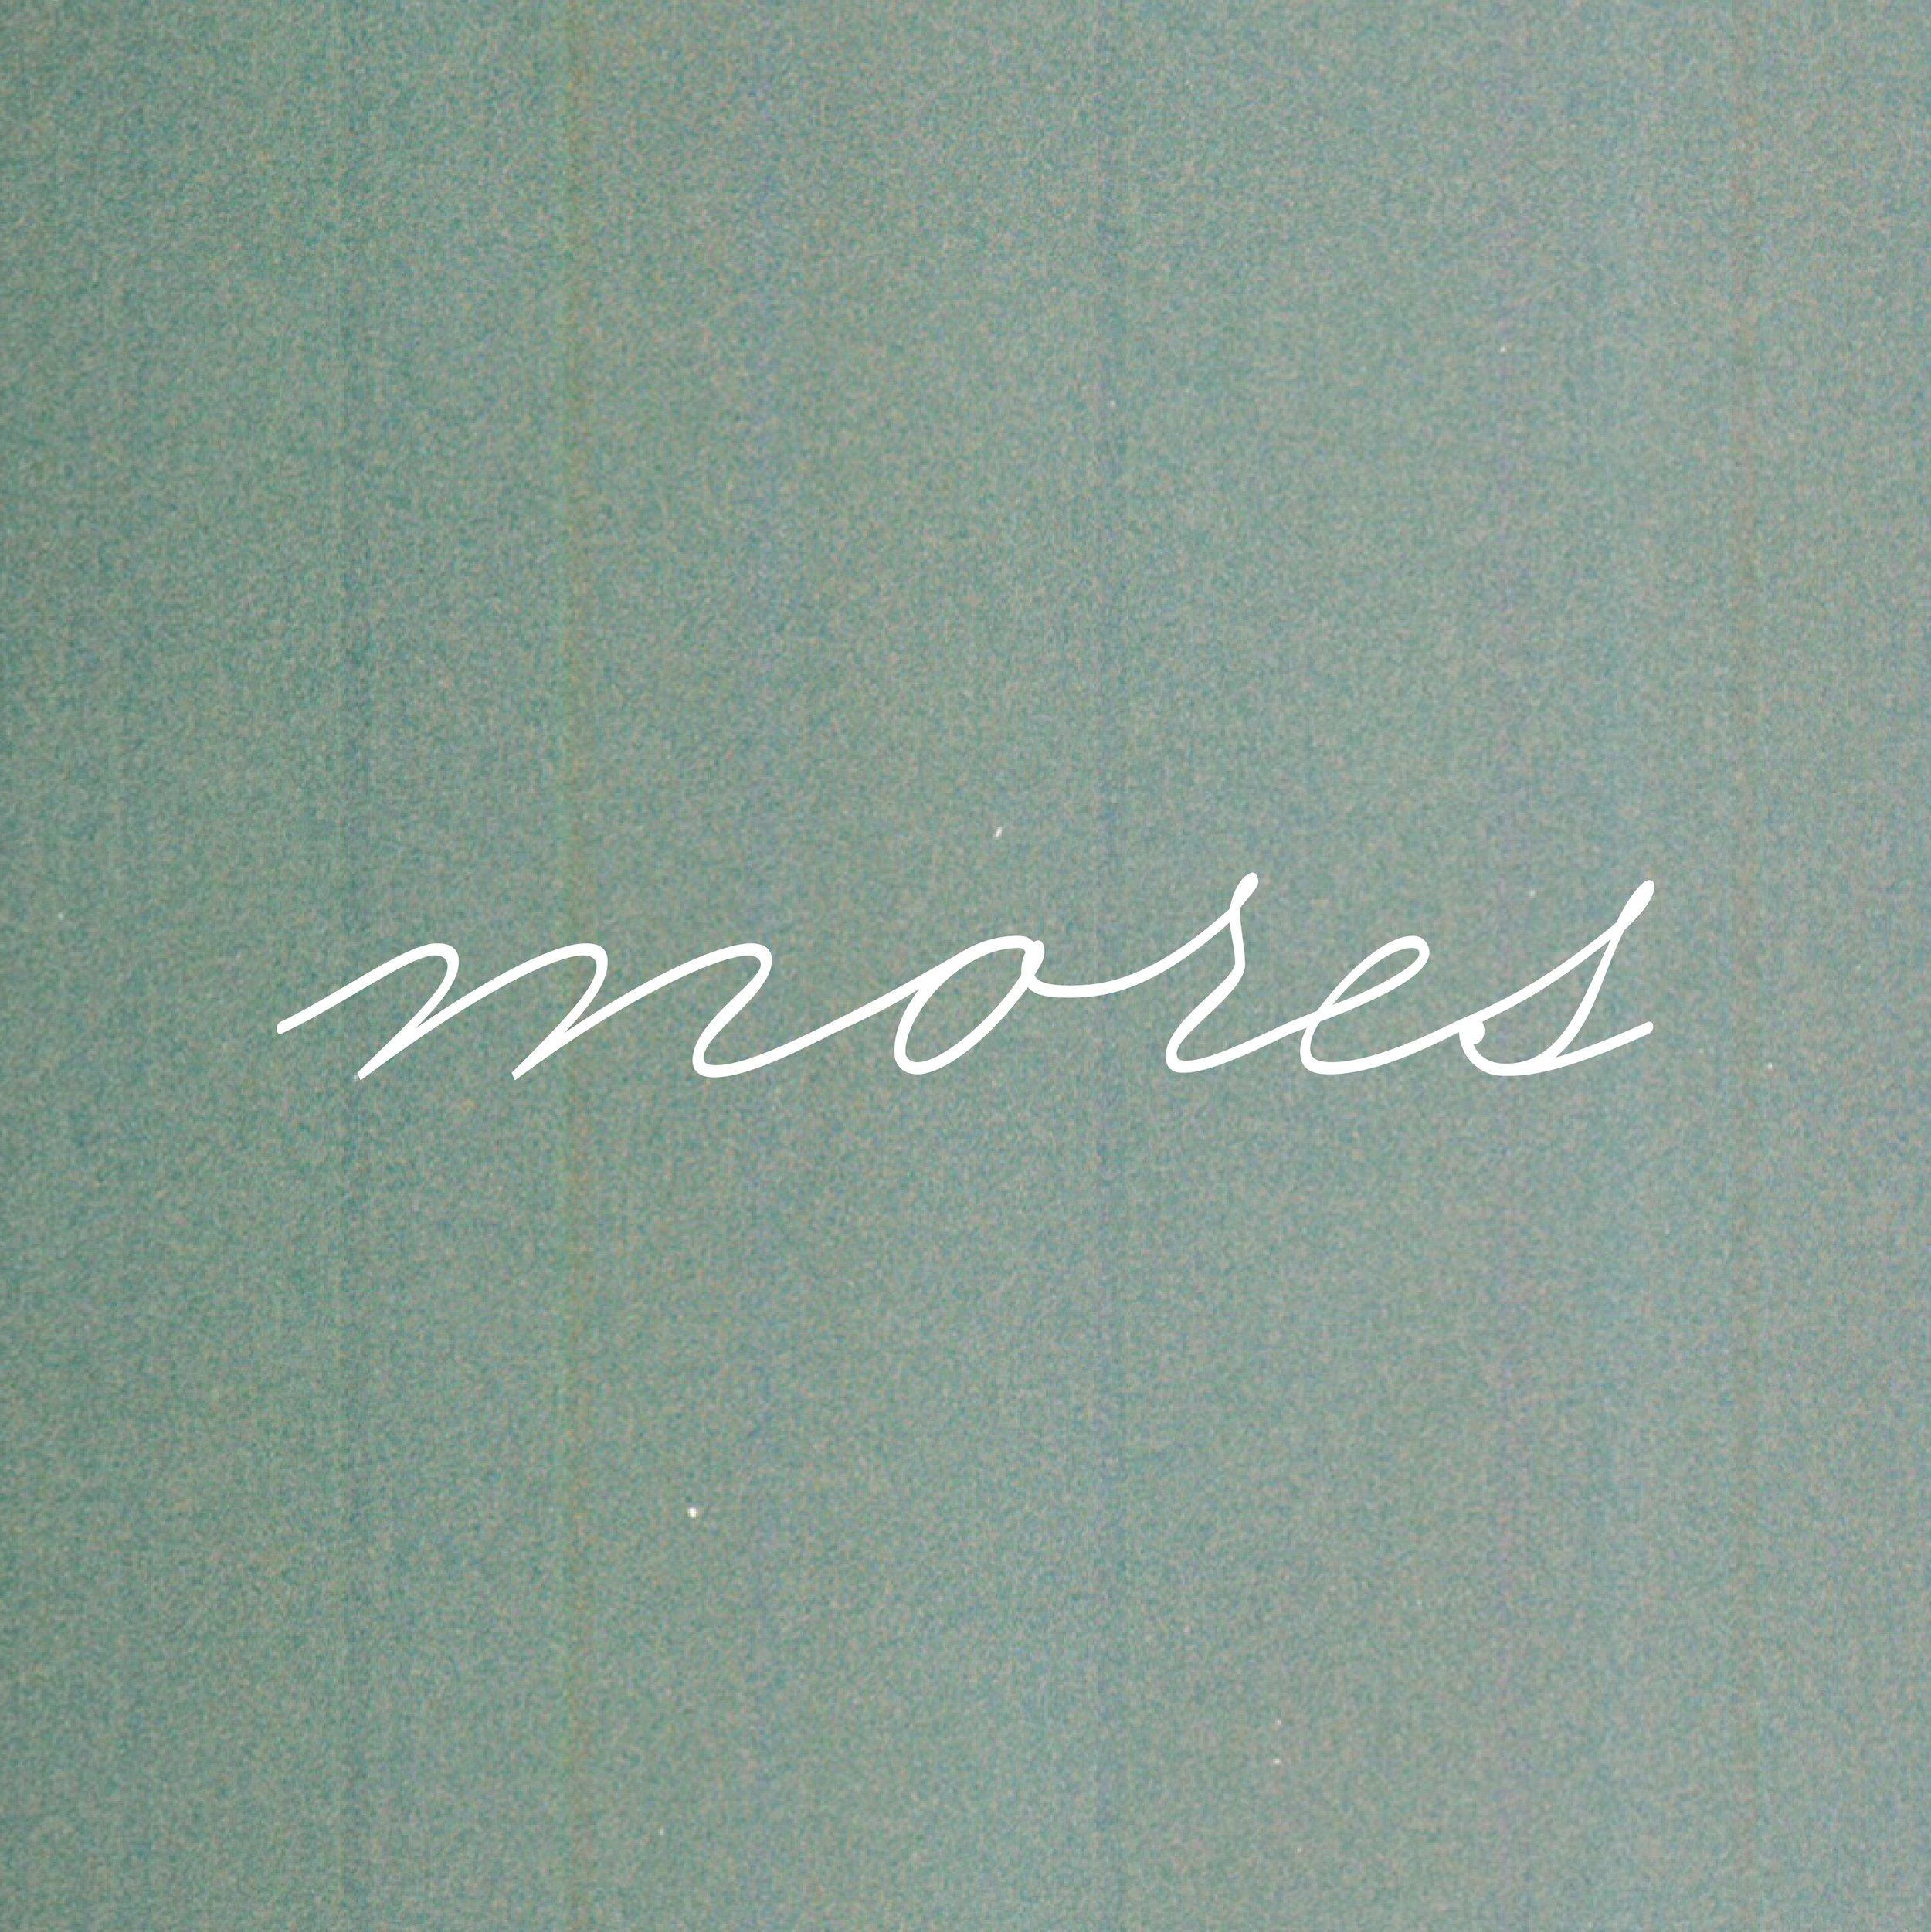 MoresMag